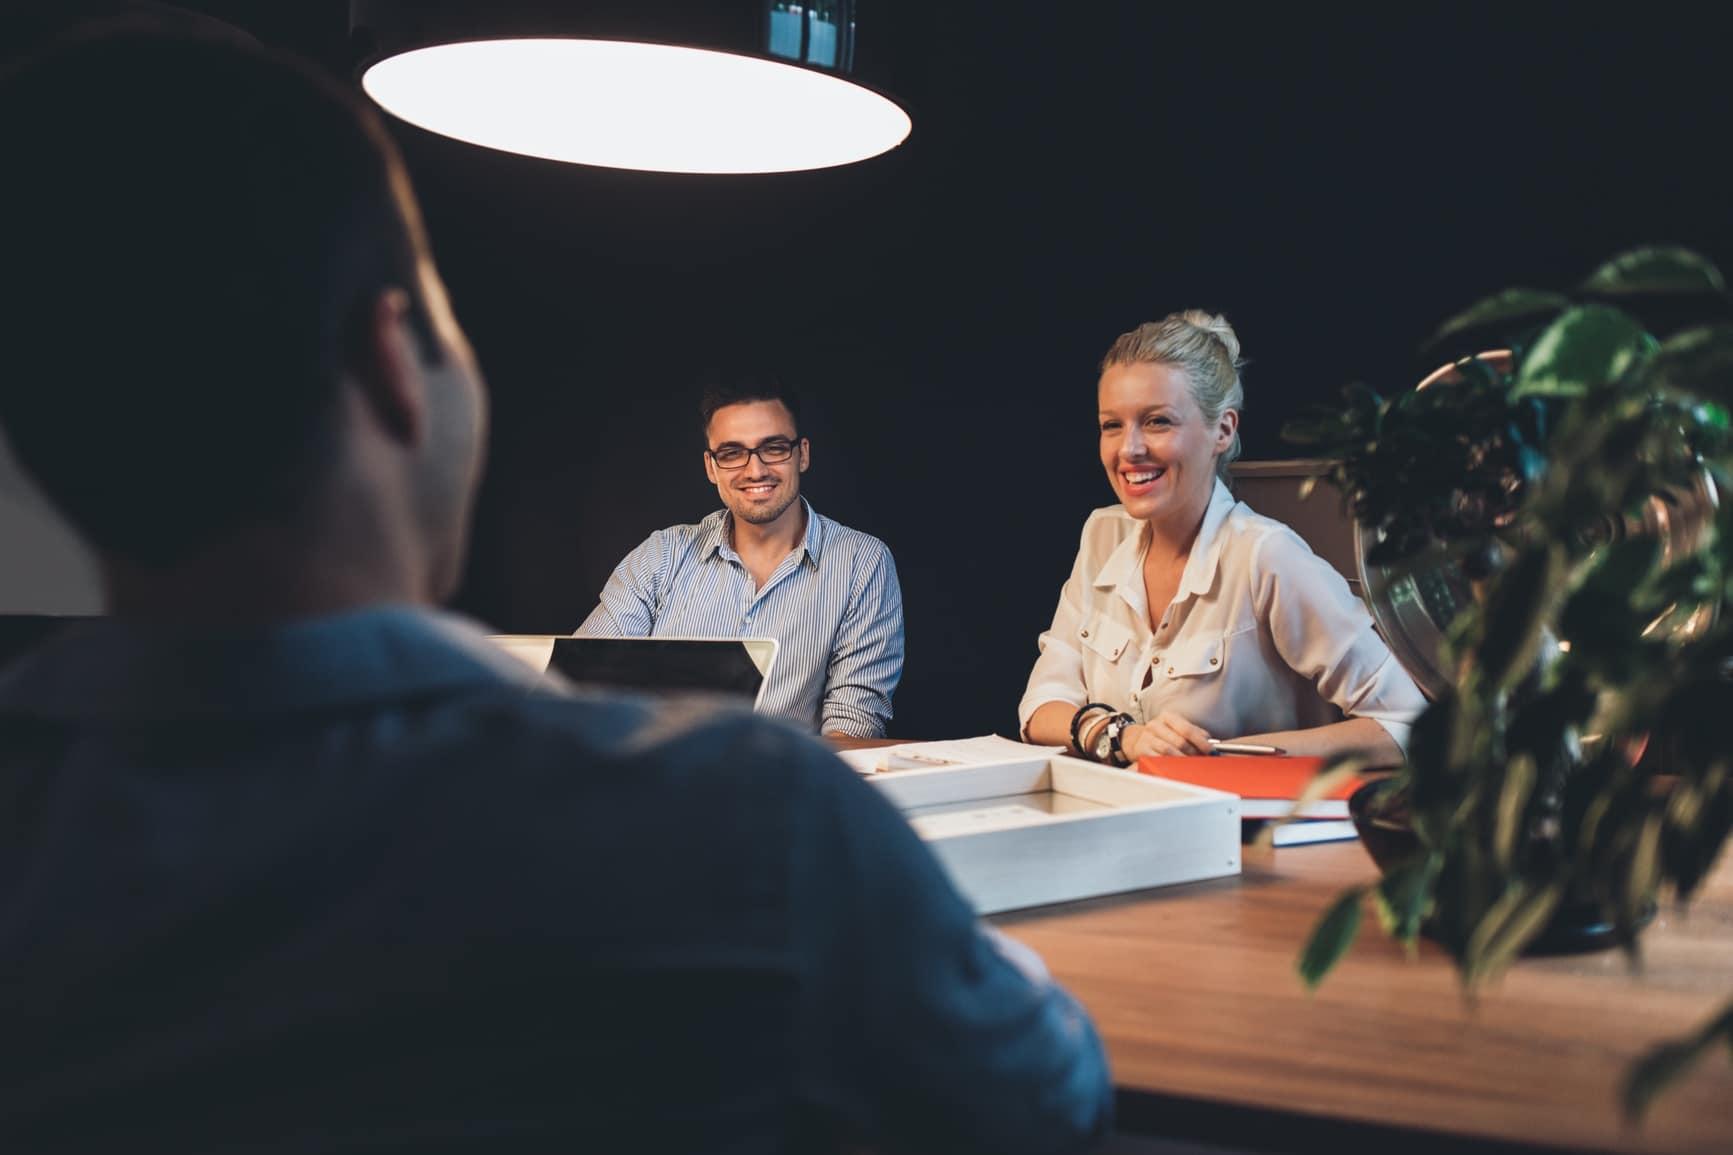 improve recruitment program through engaged employees